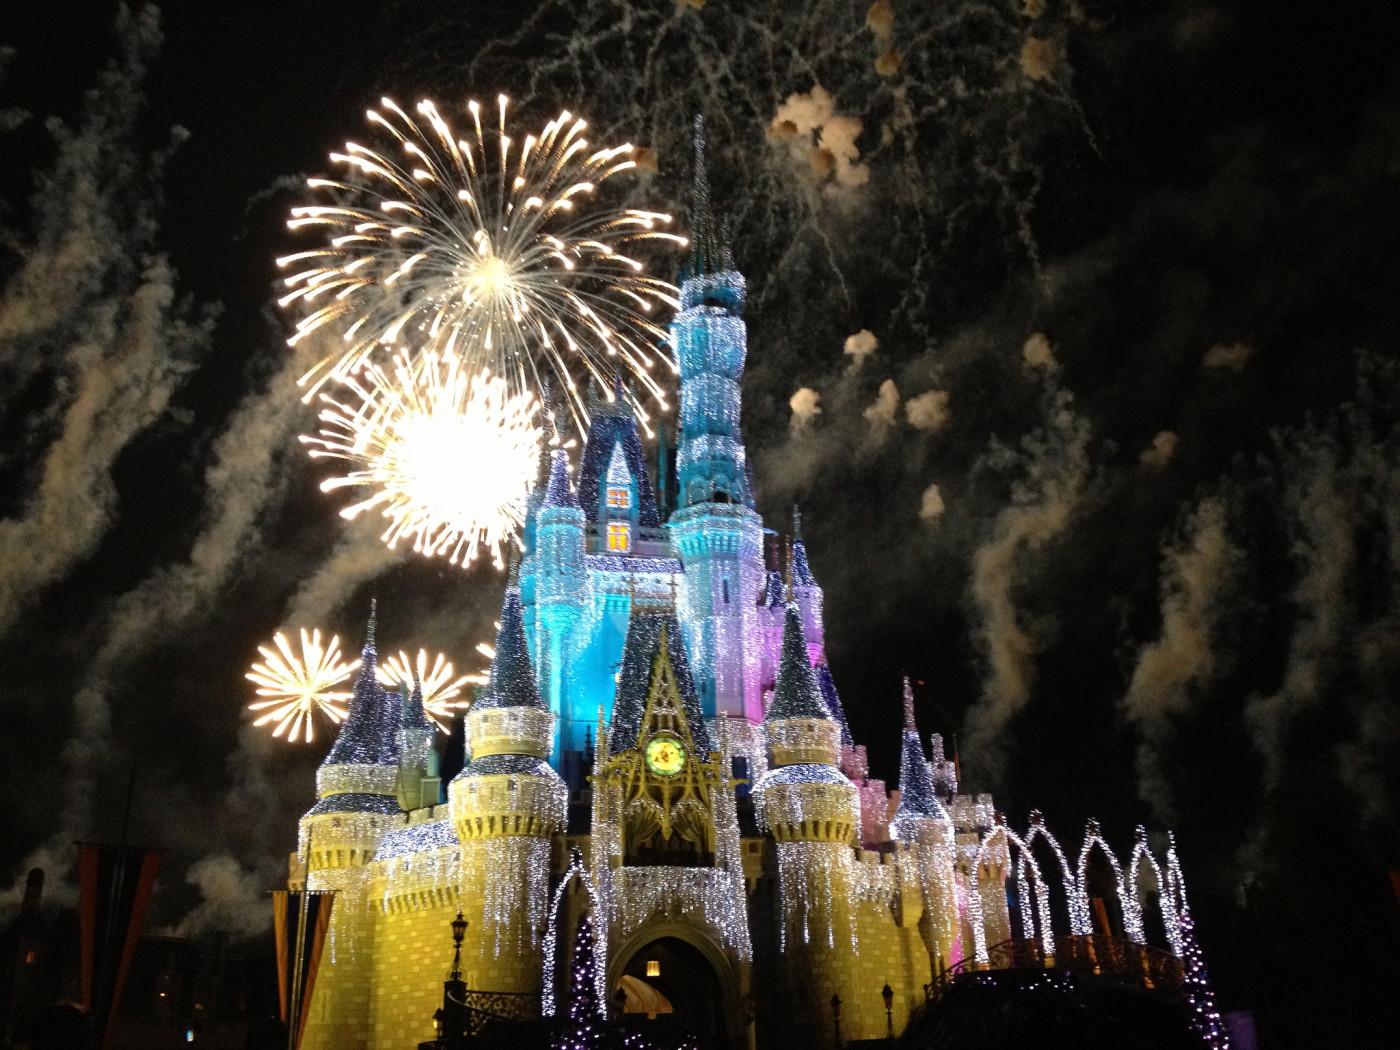 Fireworks at the Magic Kingdom Park in Disney World. Photo by Christine Urias via Flickr CC